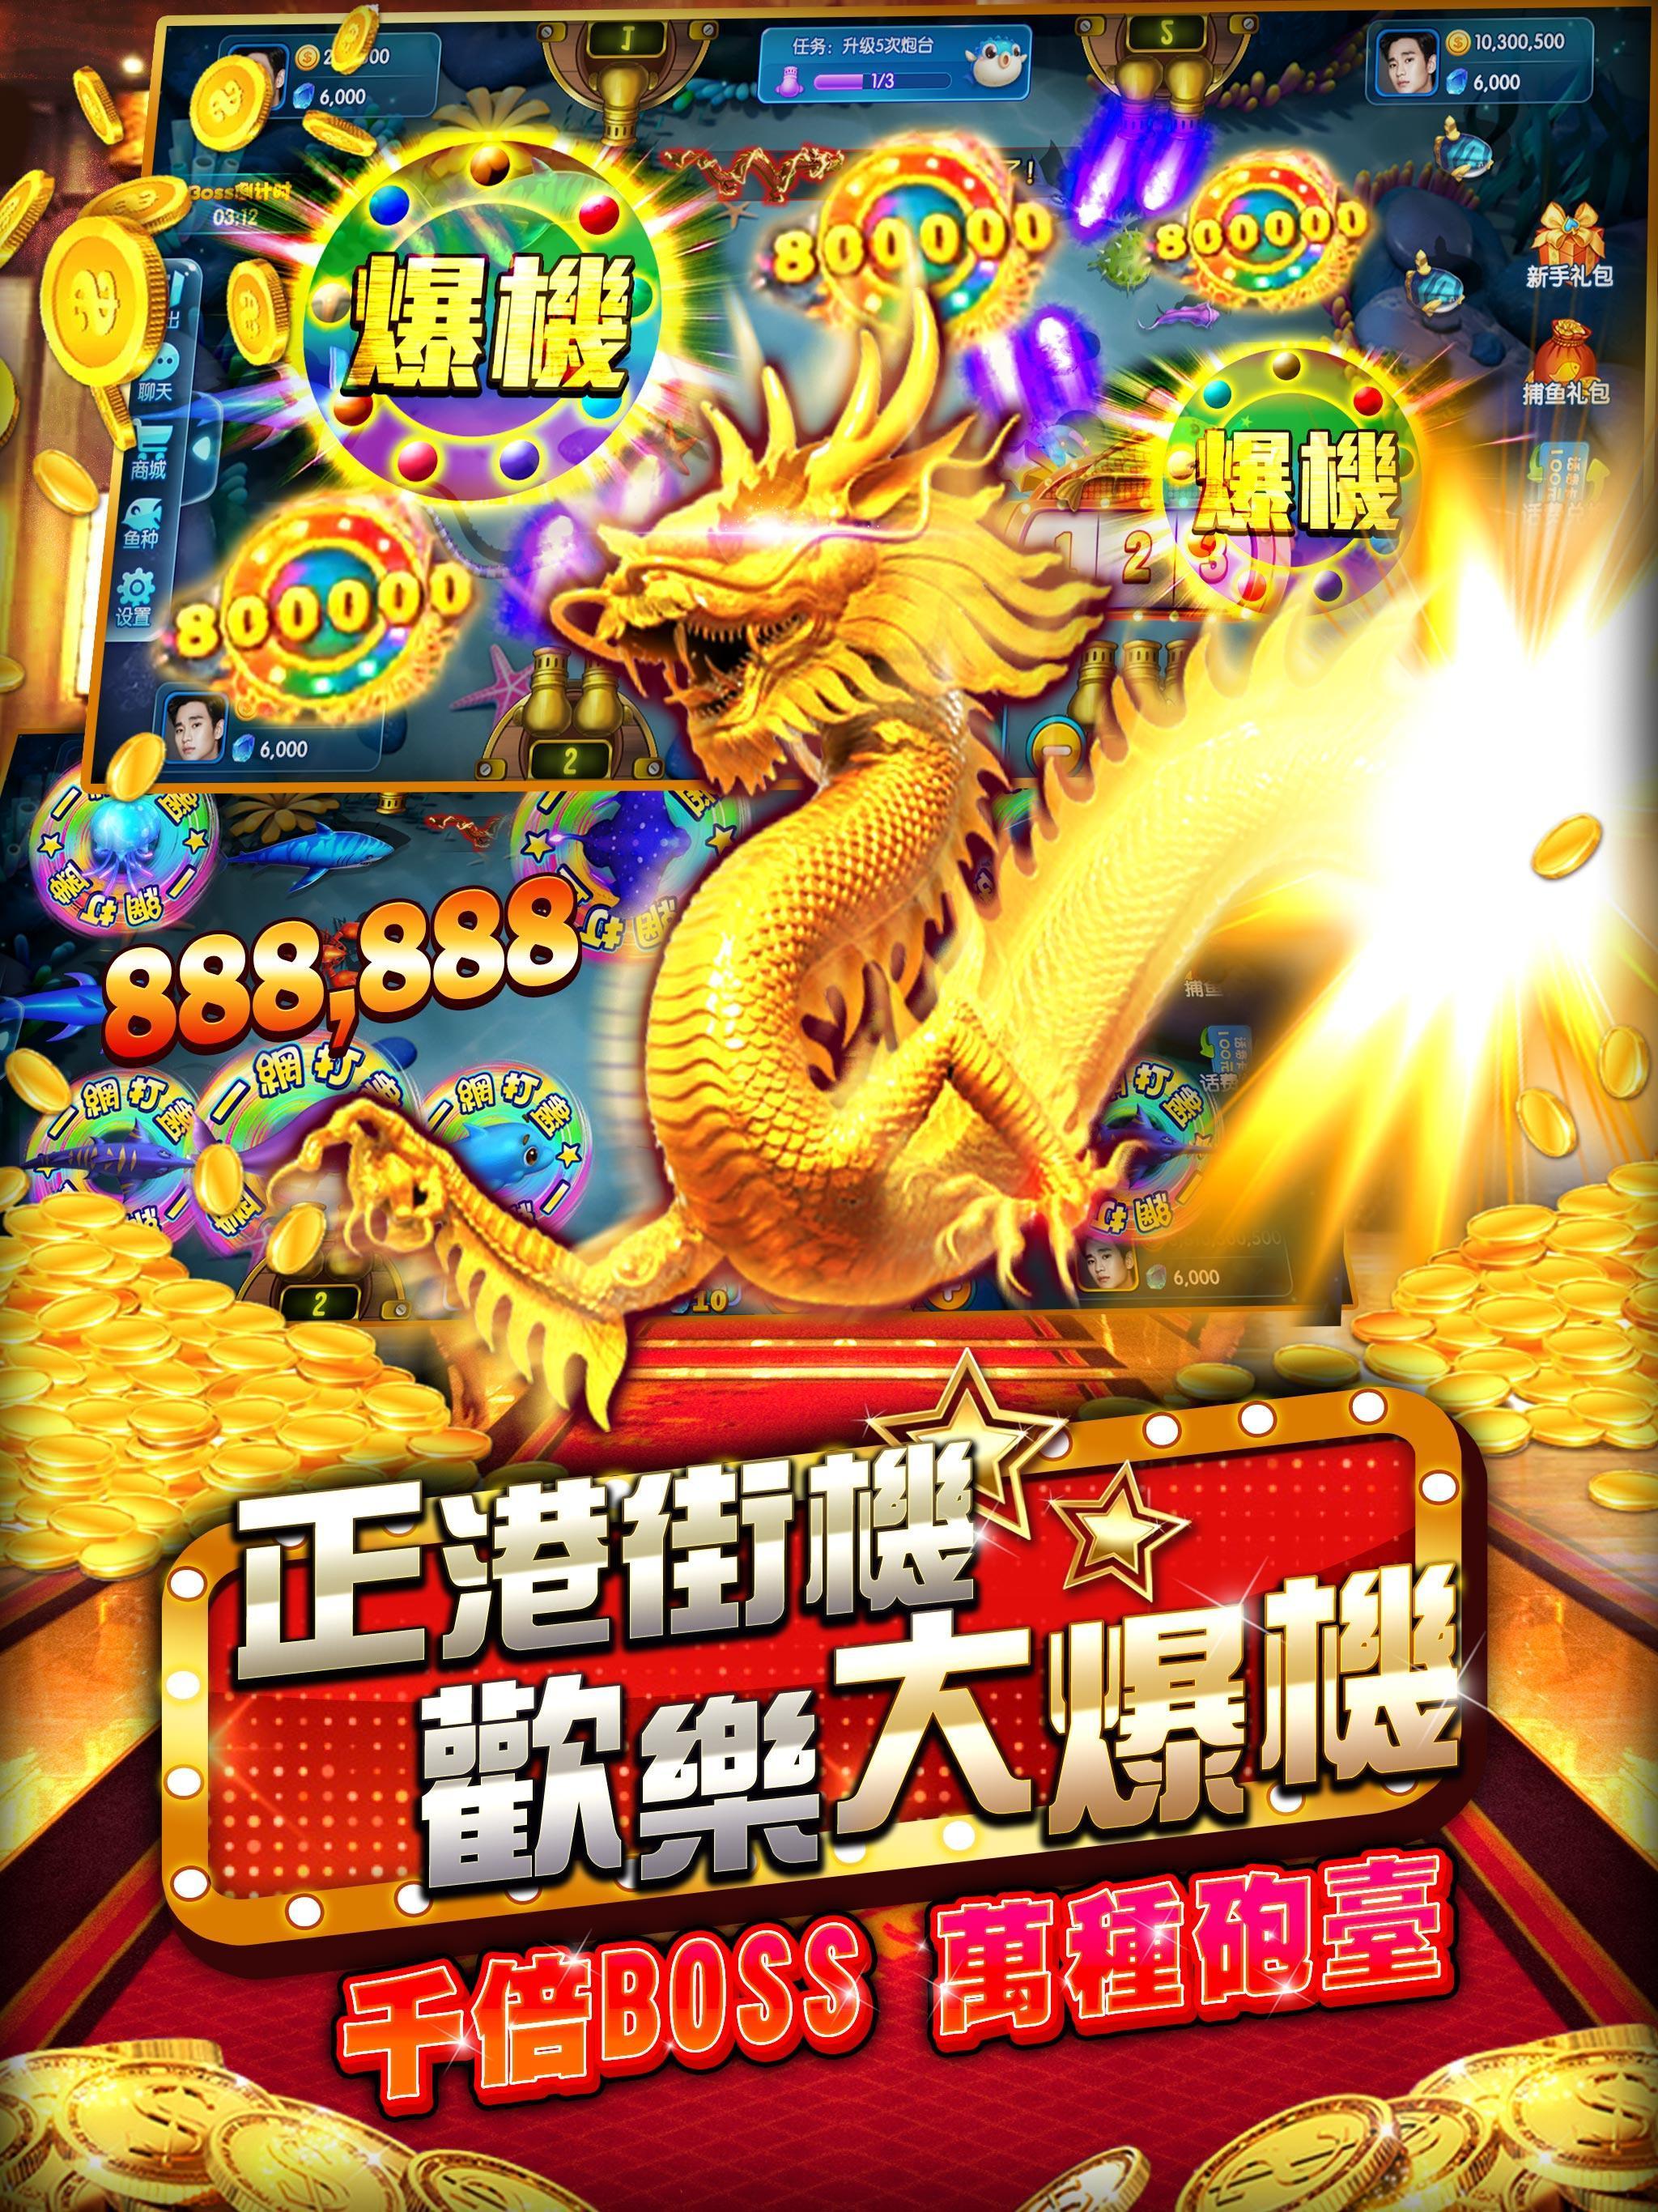 金錢豹娛樂城 2.0.0 Screenshot 7